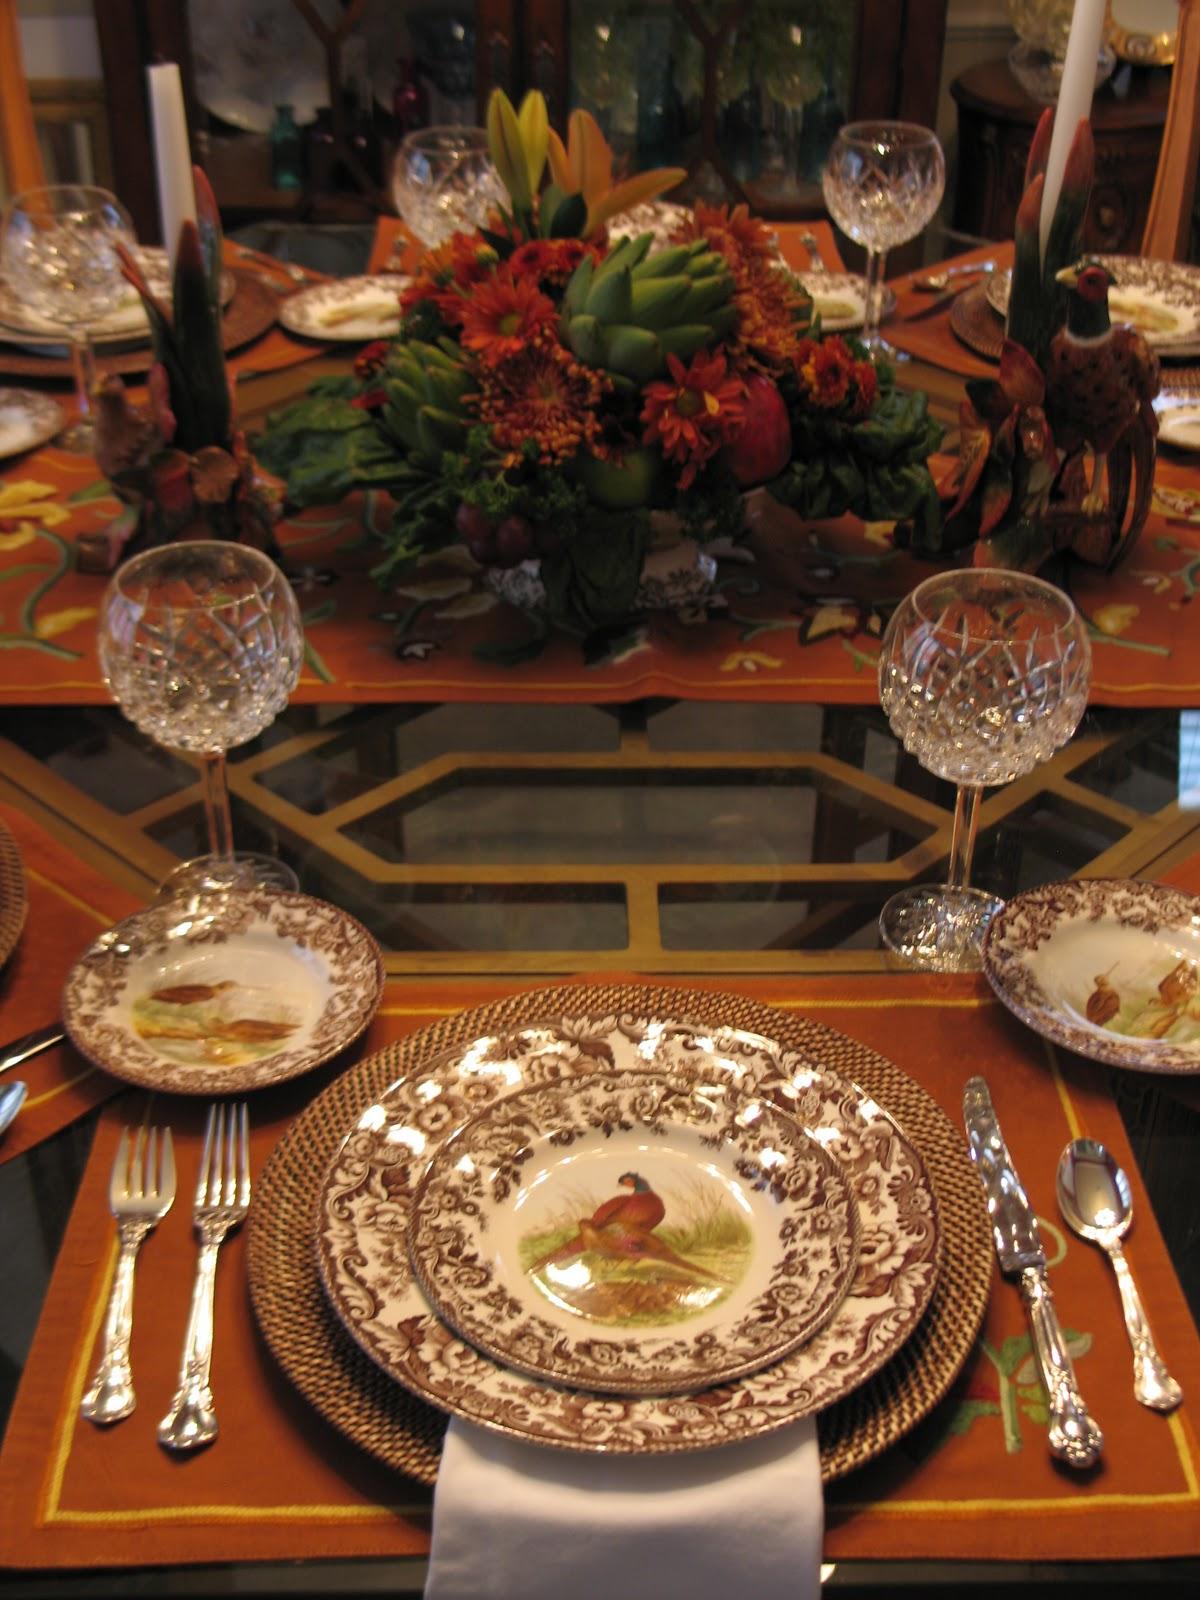 The Blackberry Vine Thankful Table